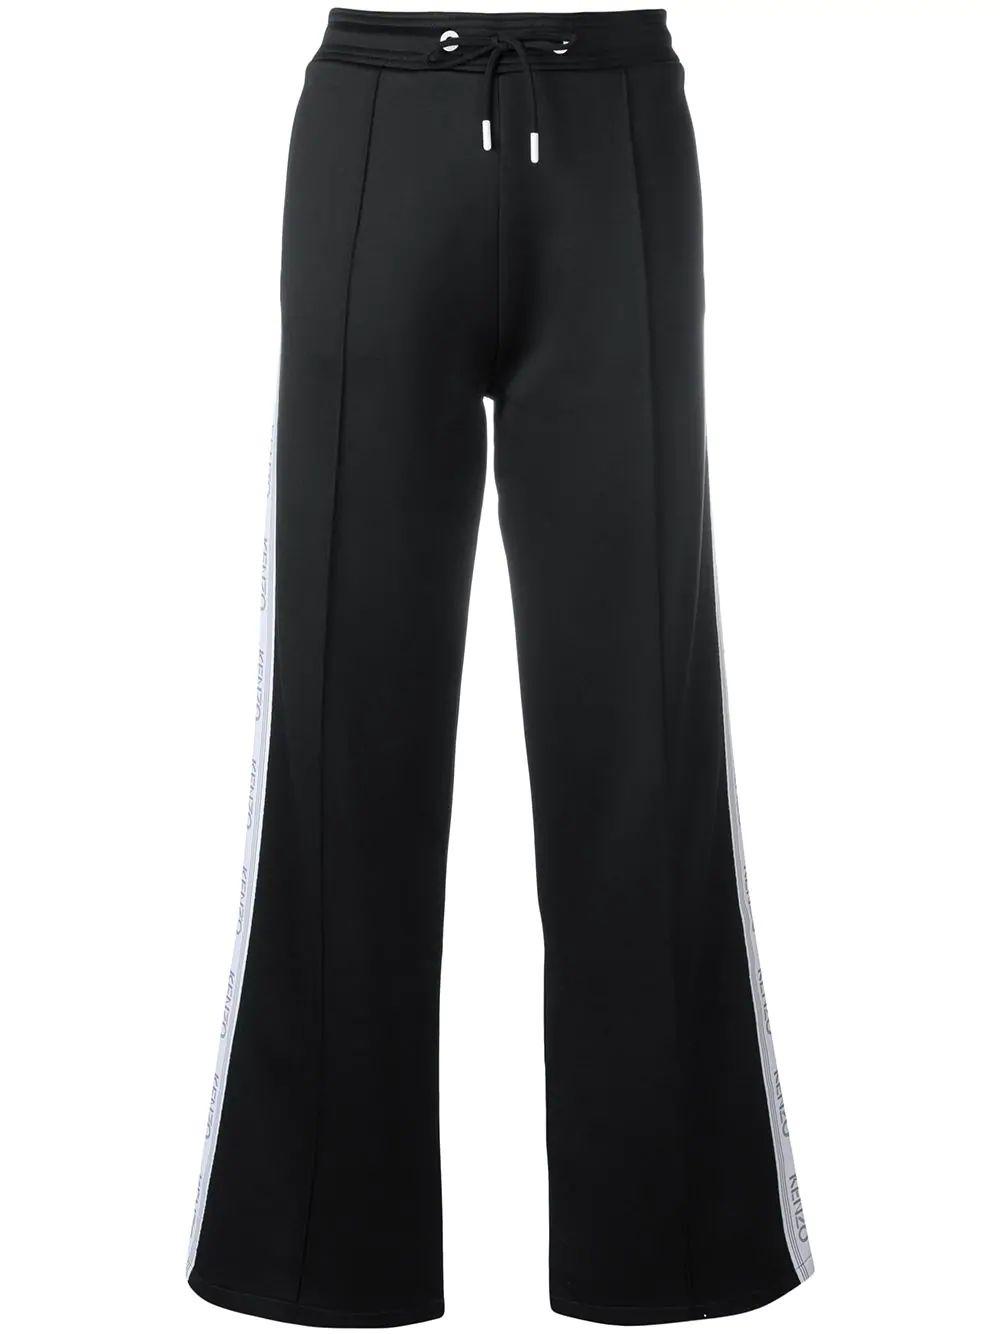 Pantalon fashio